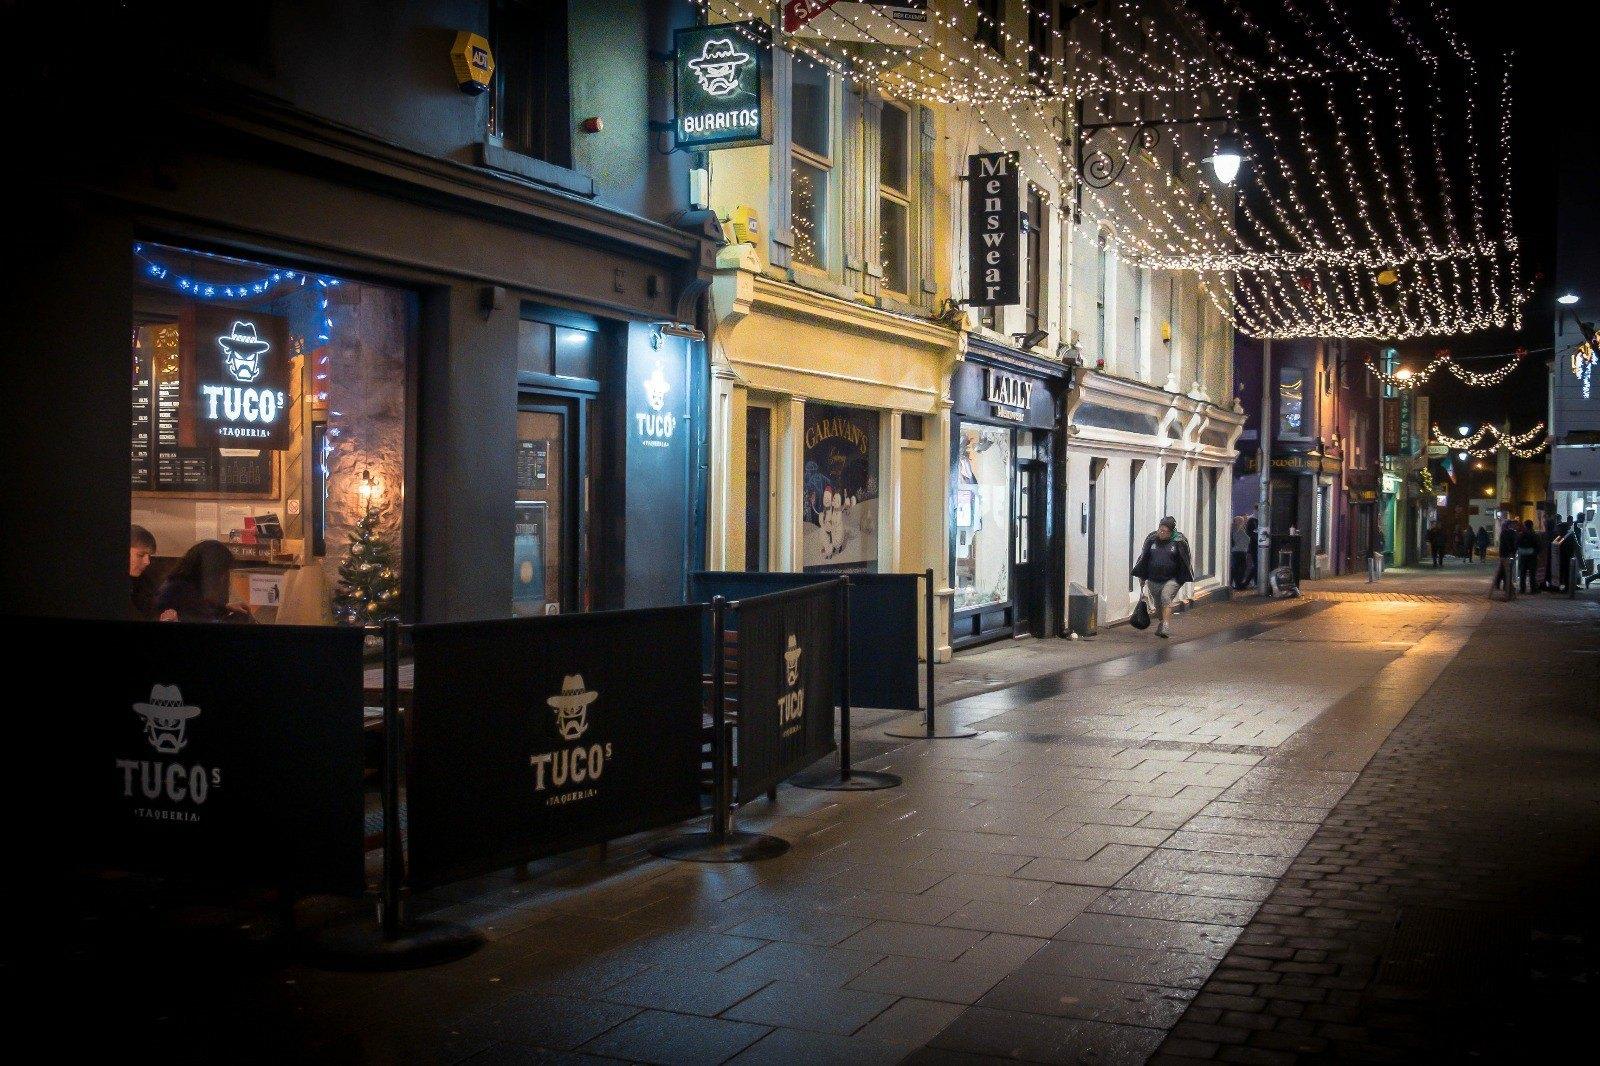 Date Singles In Galway City Galway - Meet & Chat Online